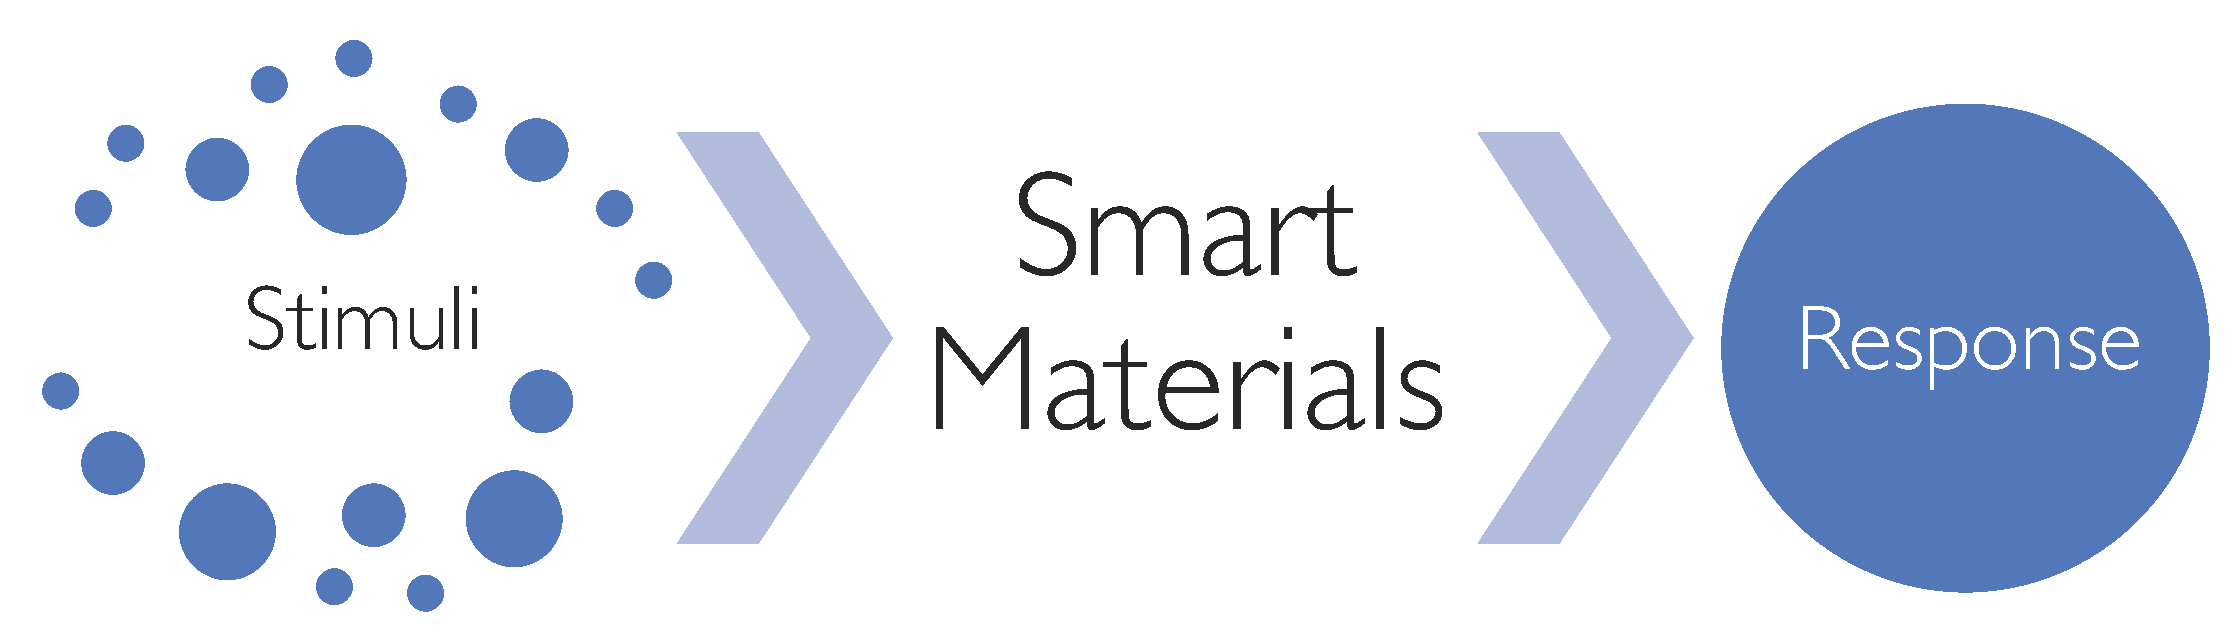 Materials 12 02216 g001